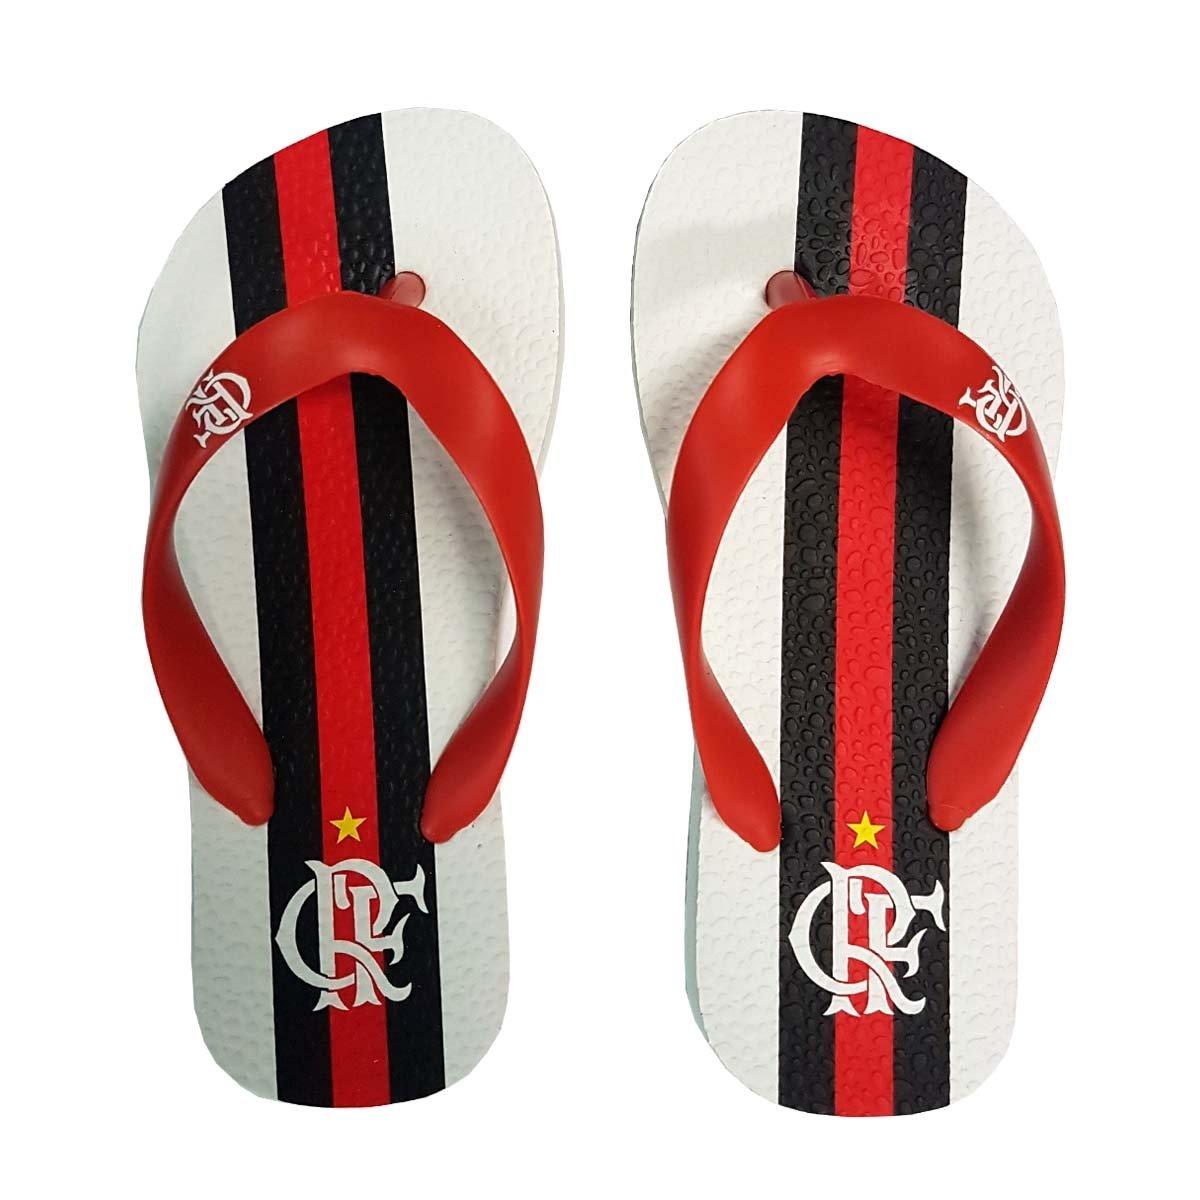 Chinelo Manto 2 2017 Branco Chinelo 2017 Branco Branco Flamengo 2 Flamengo Infantil Flamengo Chinelo Branco Infantil Manto gA85pqwS